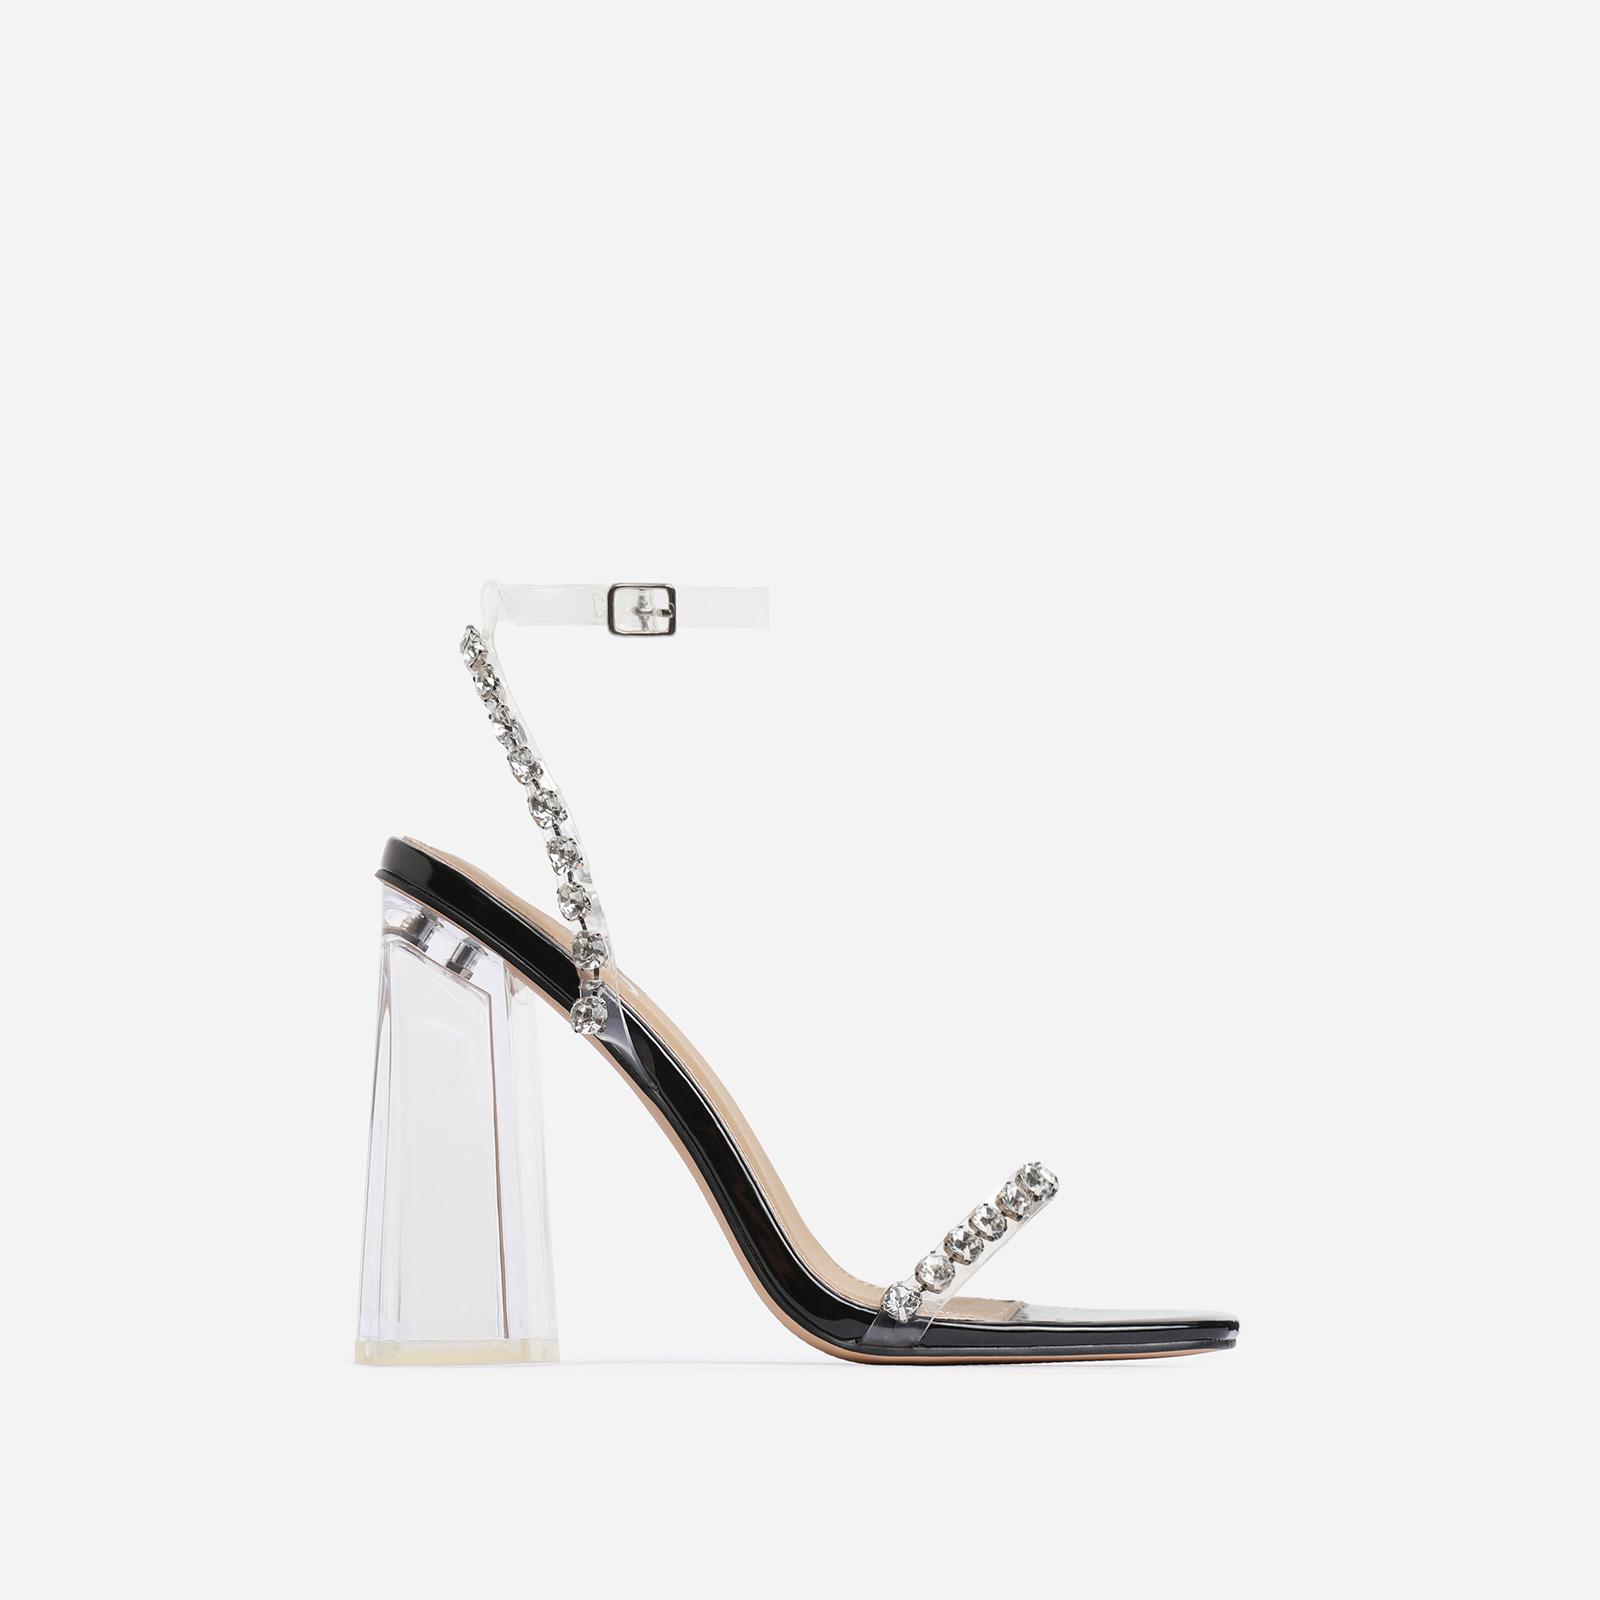 Rally Diamante Detail Flared Clear Perspex Block Heel In Black Patent